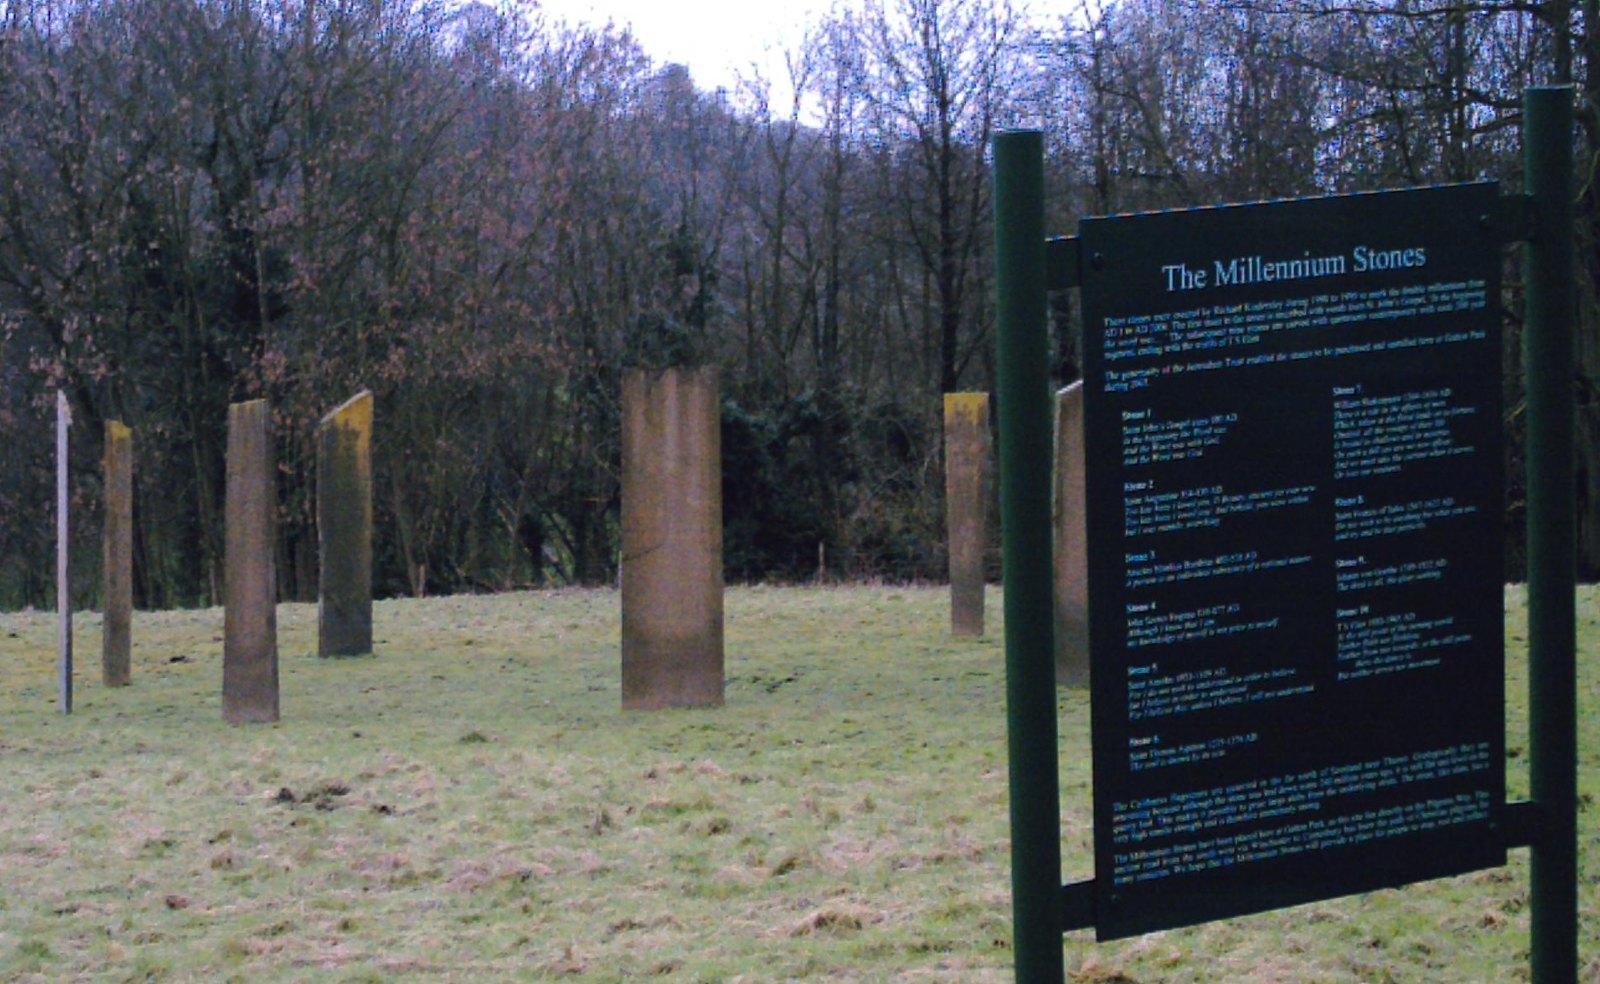 Millenium Stones Somewhere on the Merstham to Epsom walk. D.Allen Vivitar Vivicam 5199 24 Feb 2007